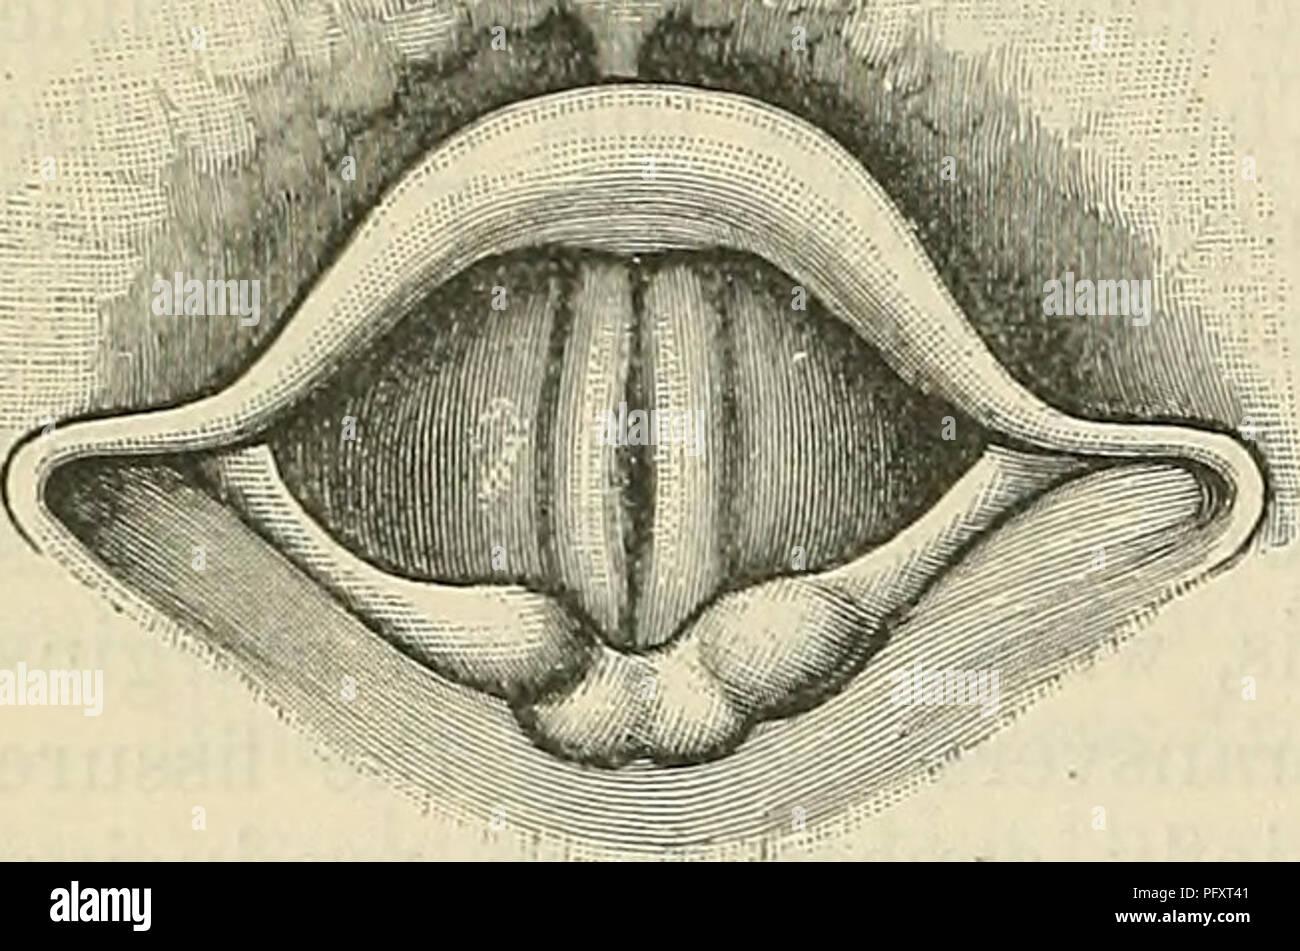 Cunningham\'s Text-book of anatomy. Anatomy. 1078 THE KESPIEATOEY ...